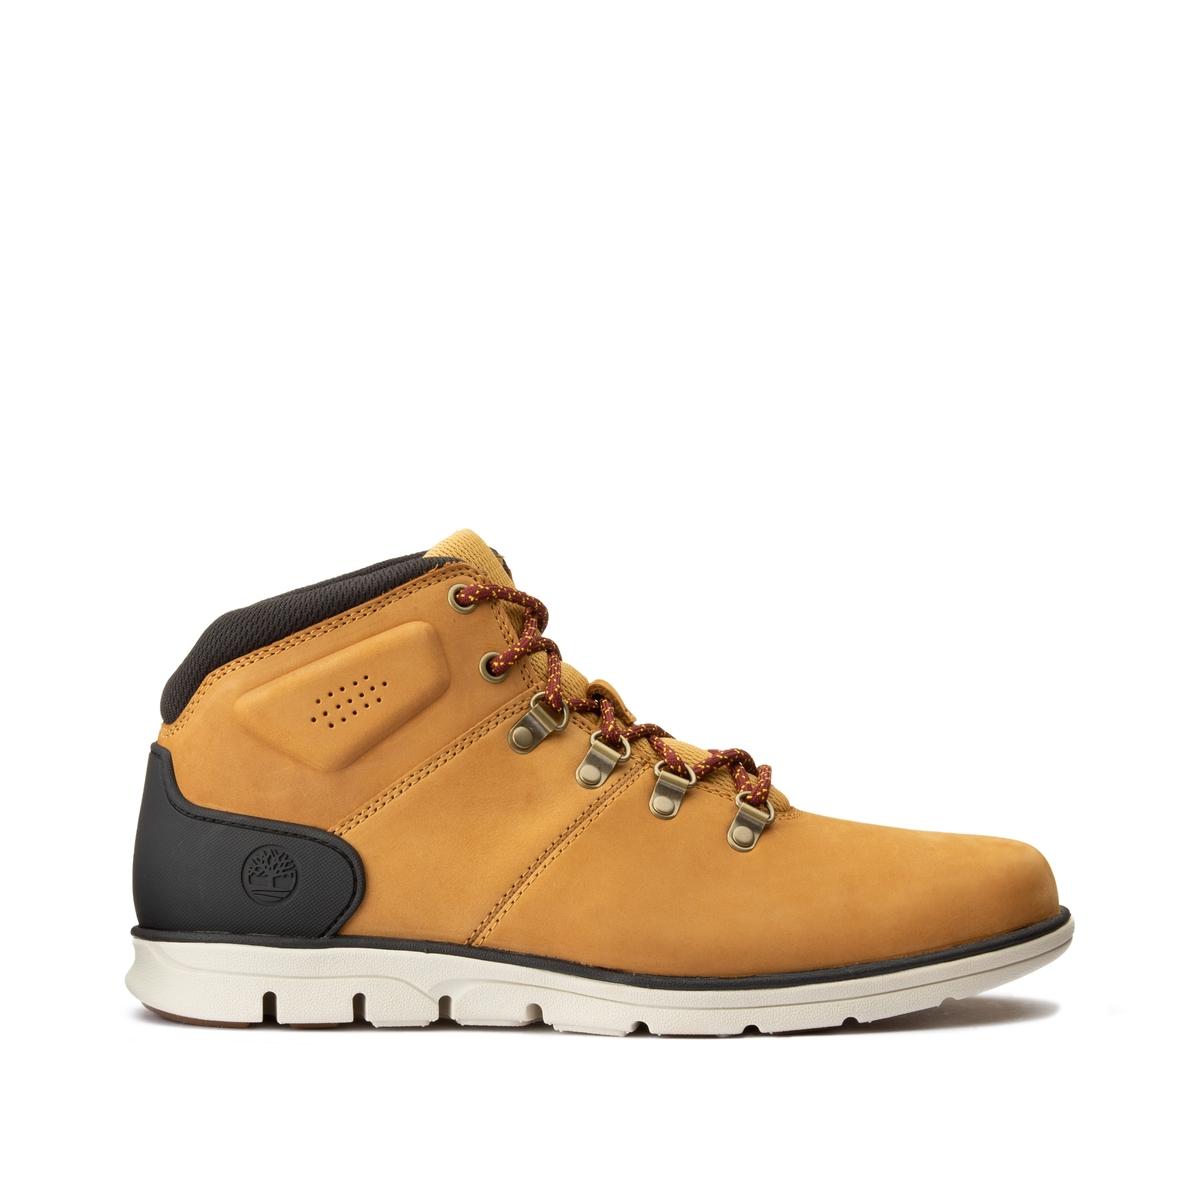 Zapatillas de piel Bradstreet Hiker